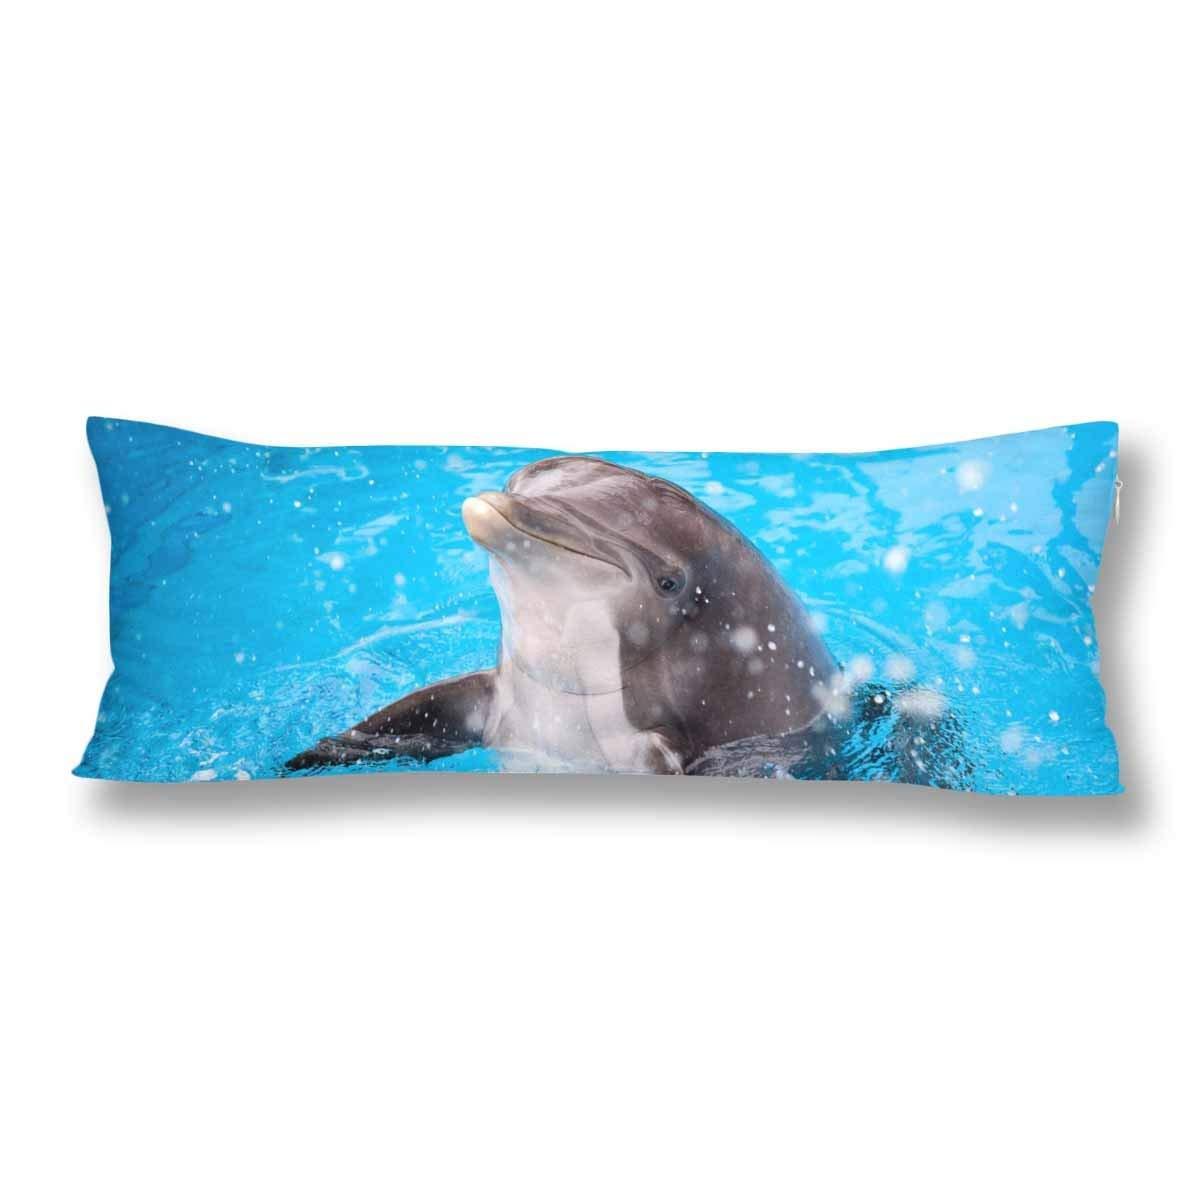 ABPHOTO Ocean Animal Dolphin Body Pillow Covers Pillowcase 20x60 inch Blue Sea Water Body Pillow Case Protector